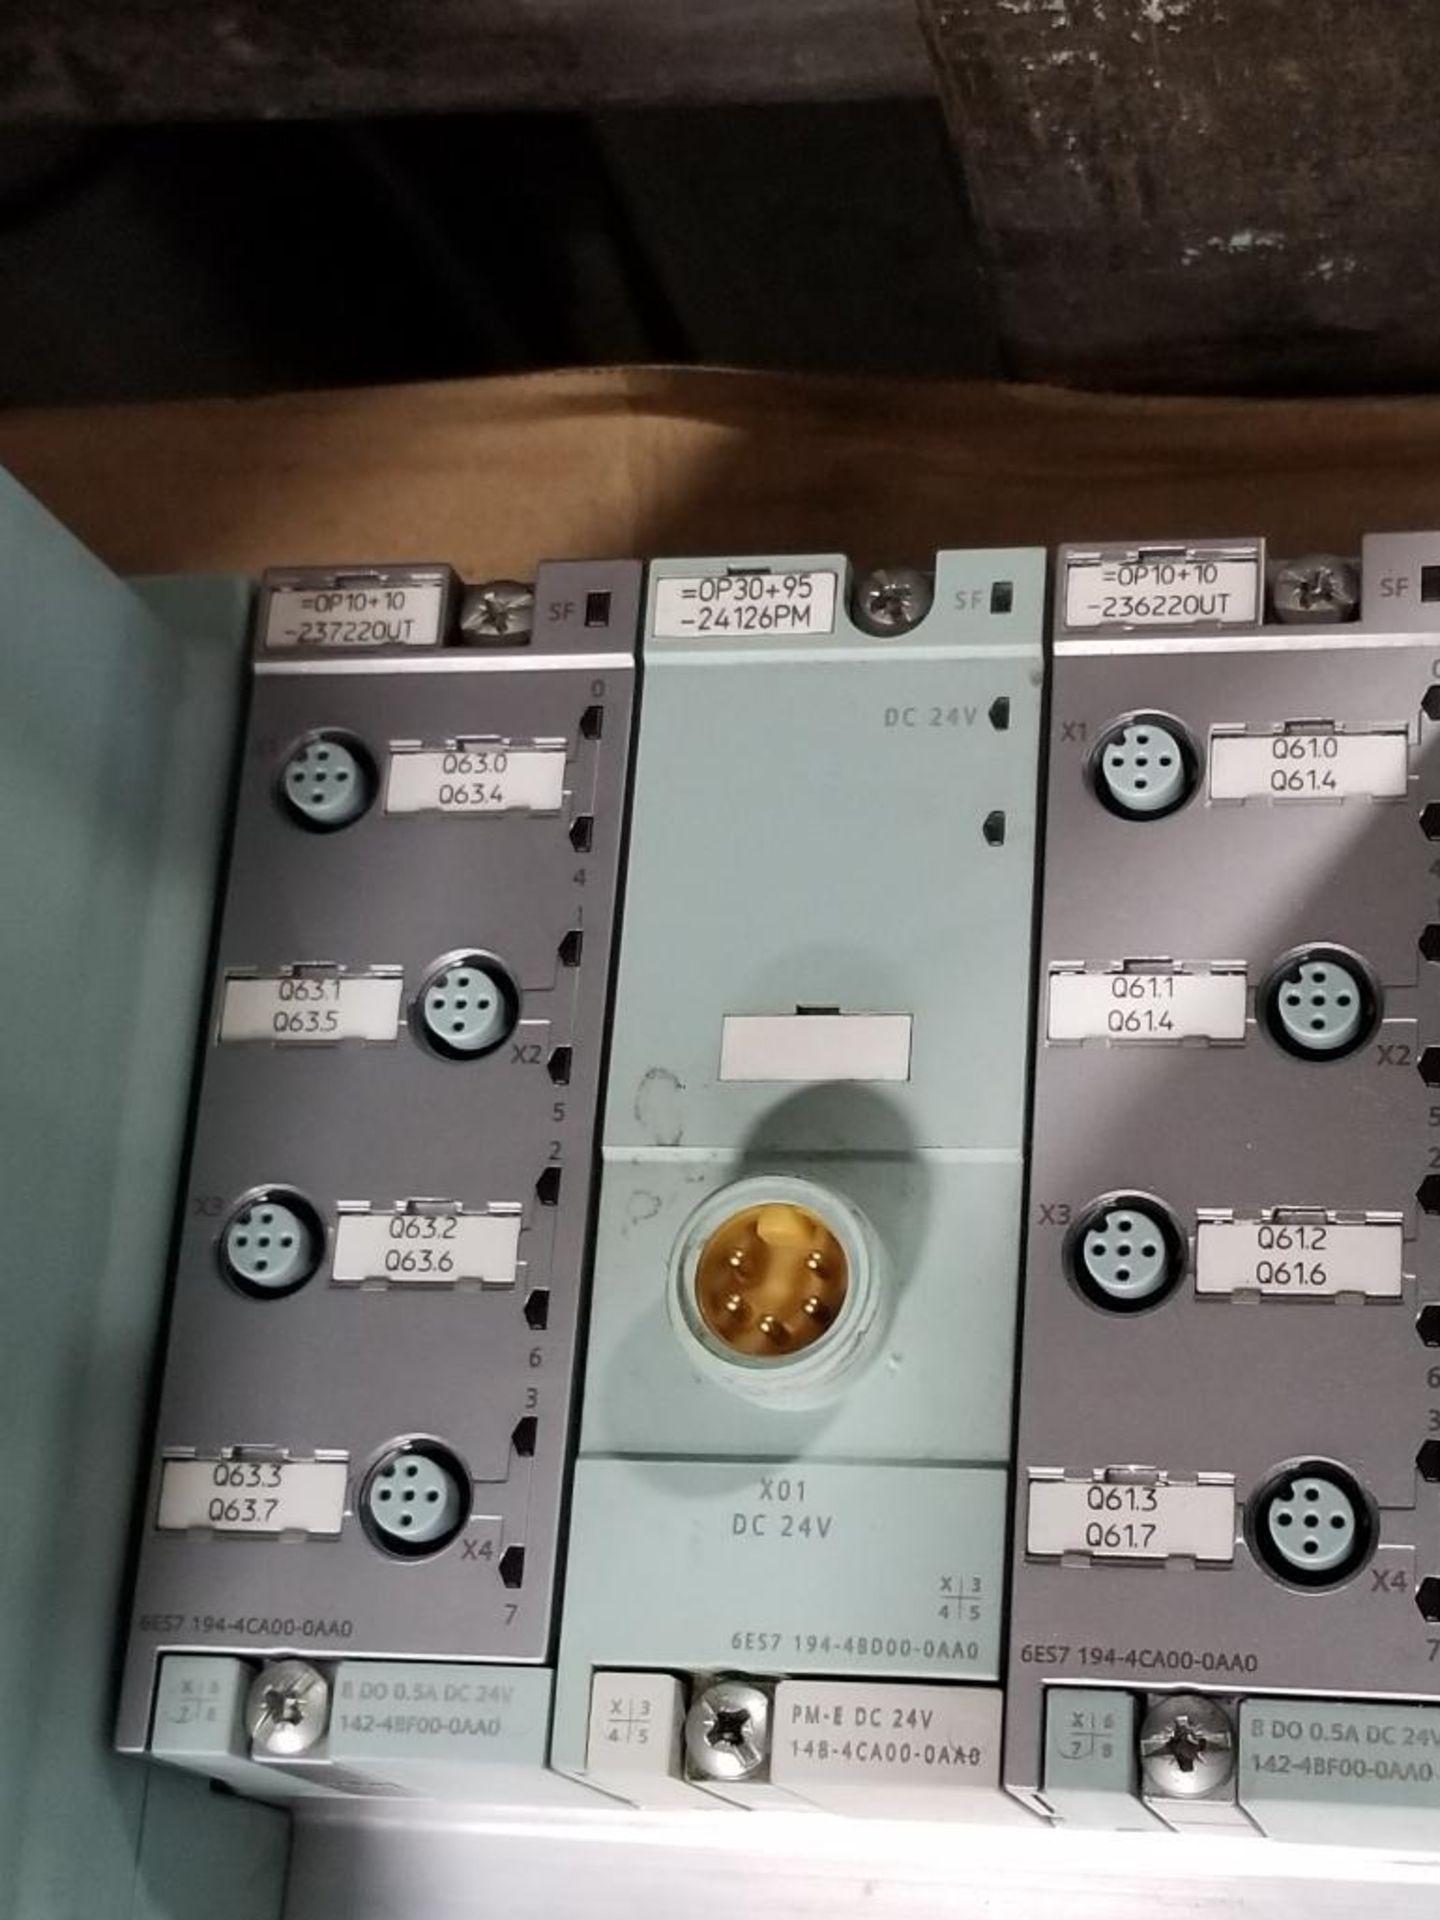 Siemens RSe-ST 3RK1304-5KS40-5AA3 Reversing starter and flow control line. - Image 3 of 6